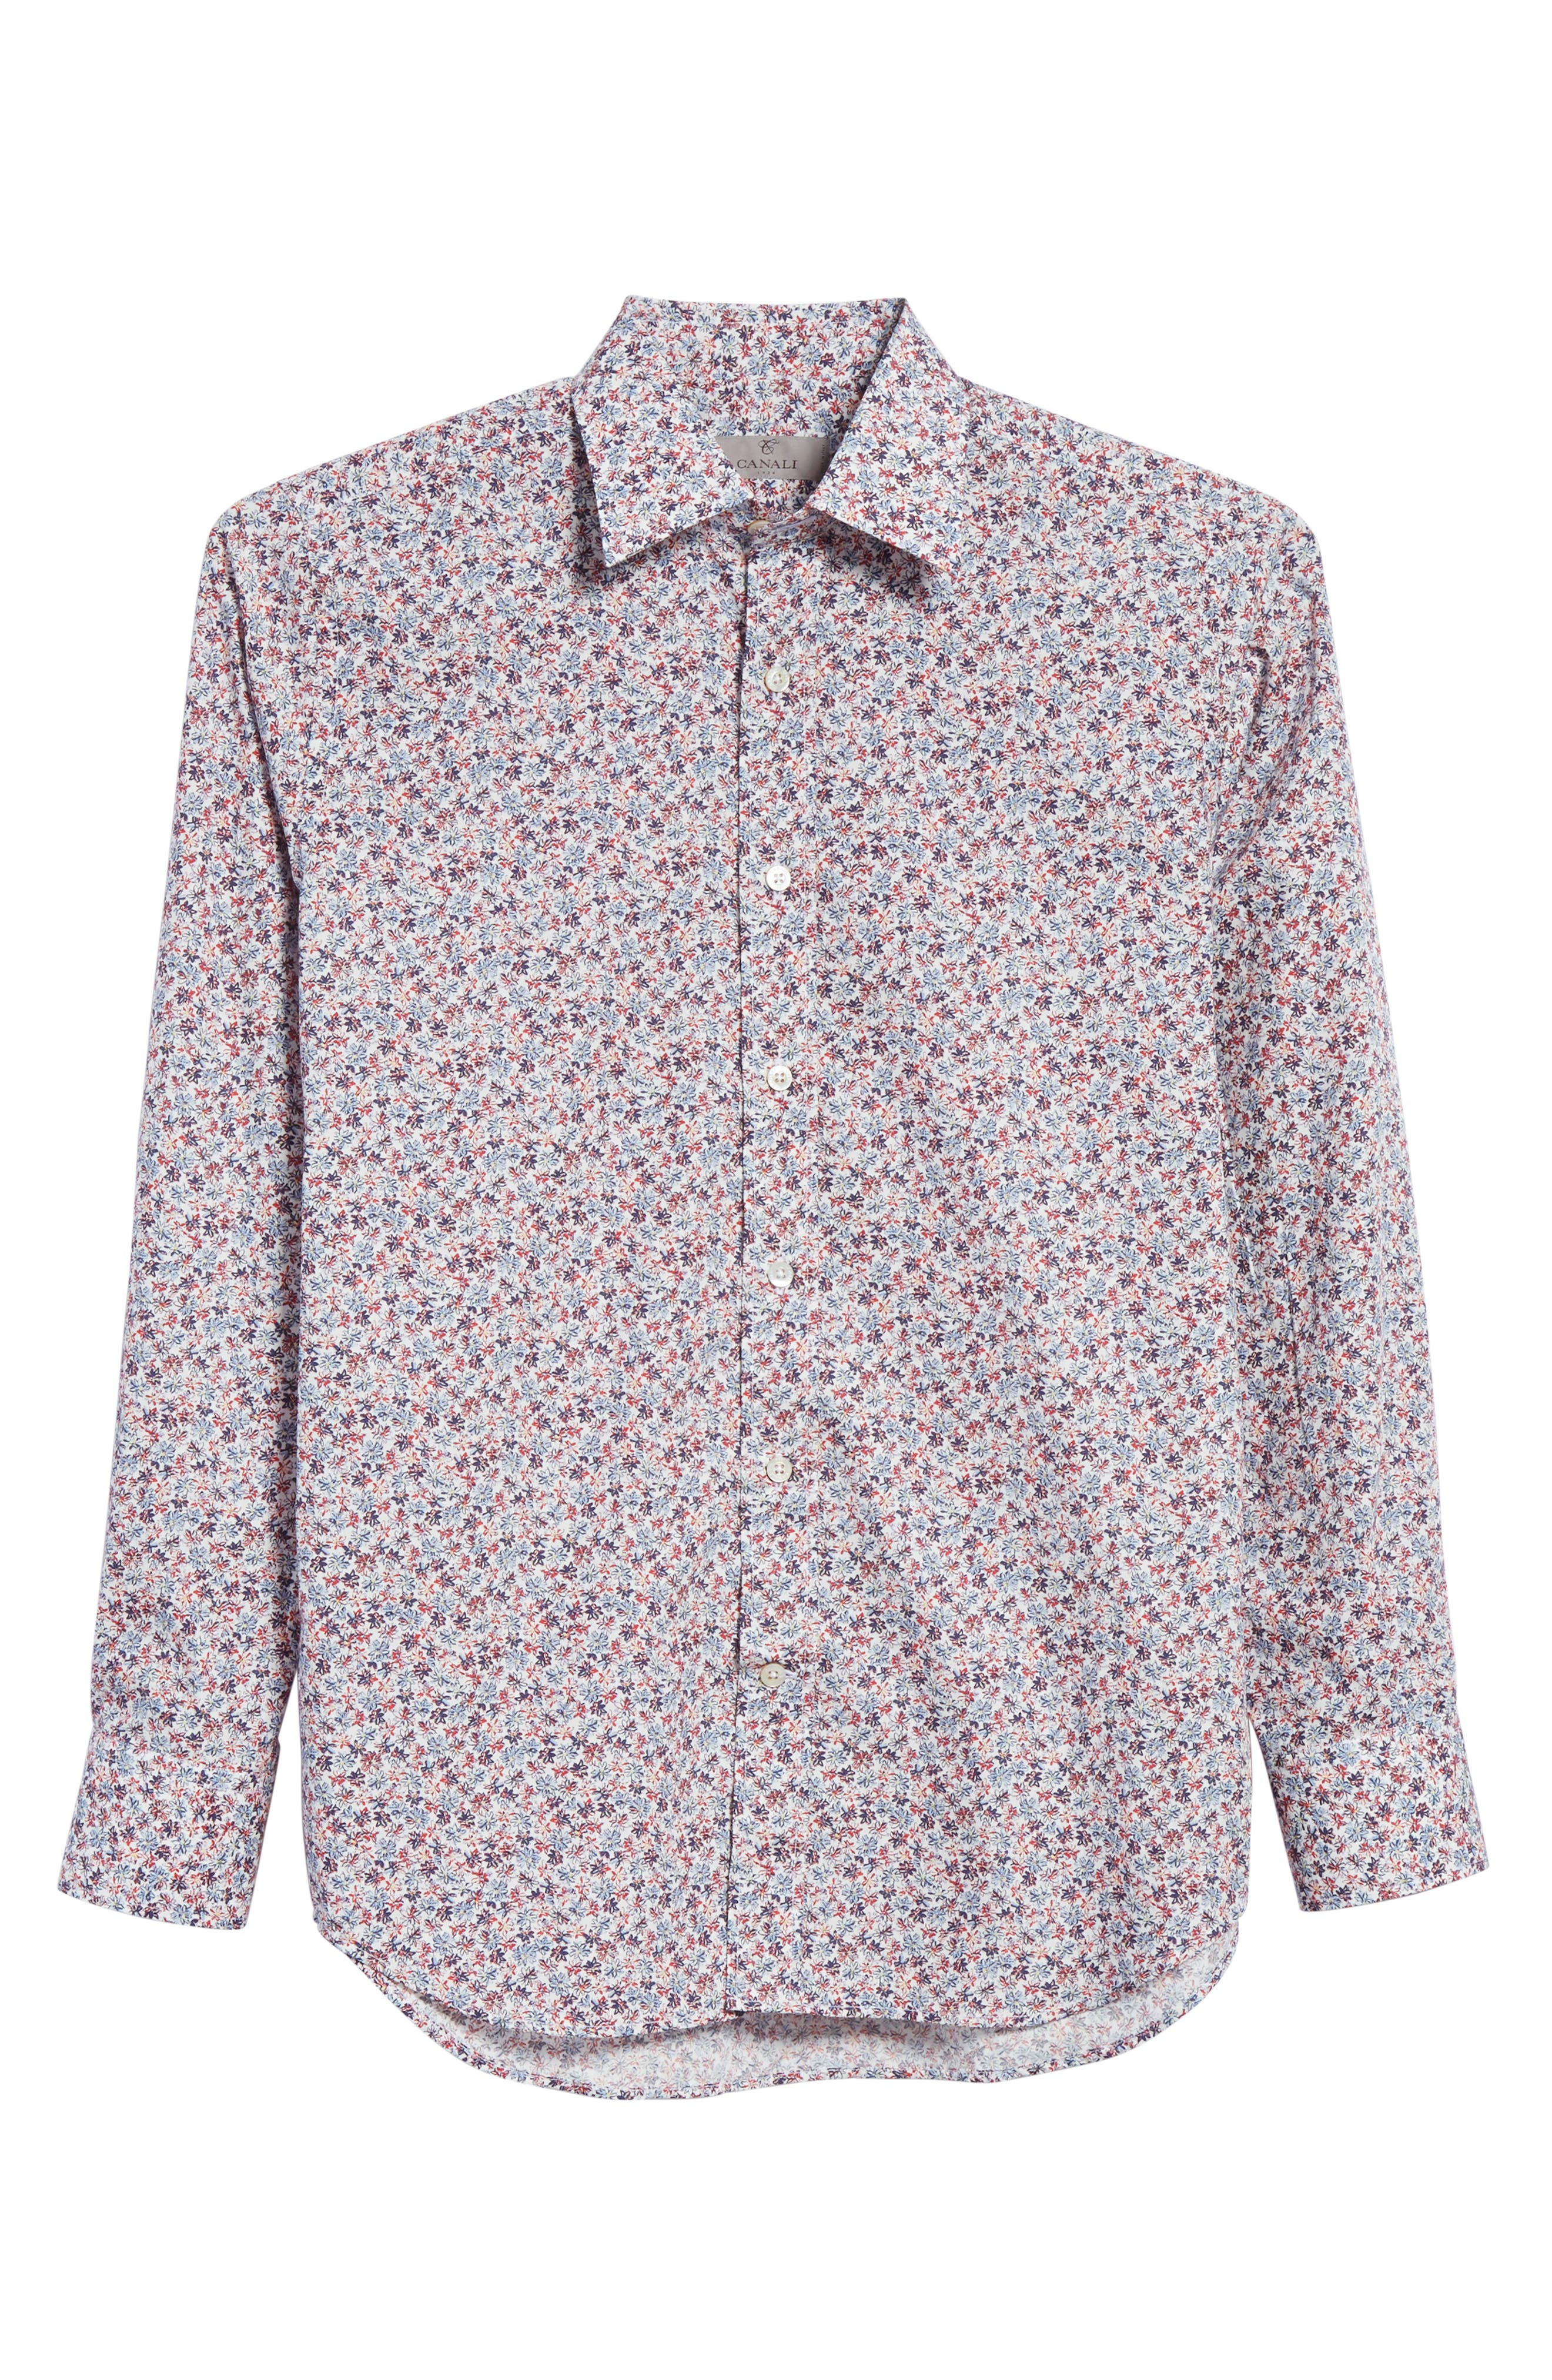 Regular Fit Floral Sport Shirt,                             Alternate thumbnail 6, color,                             White/ Red/ Navy